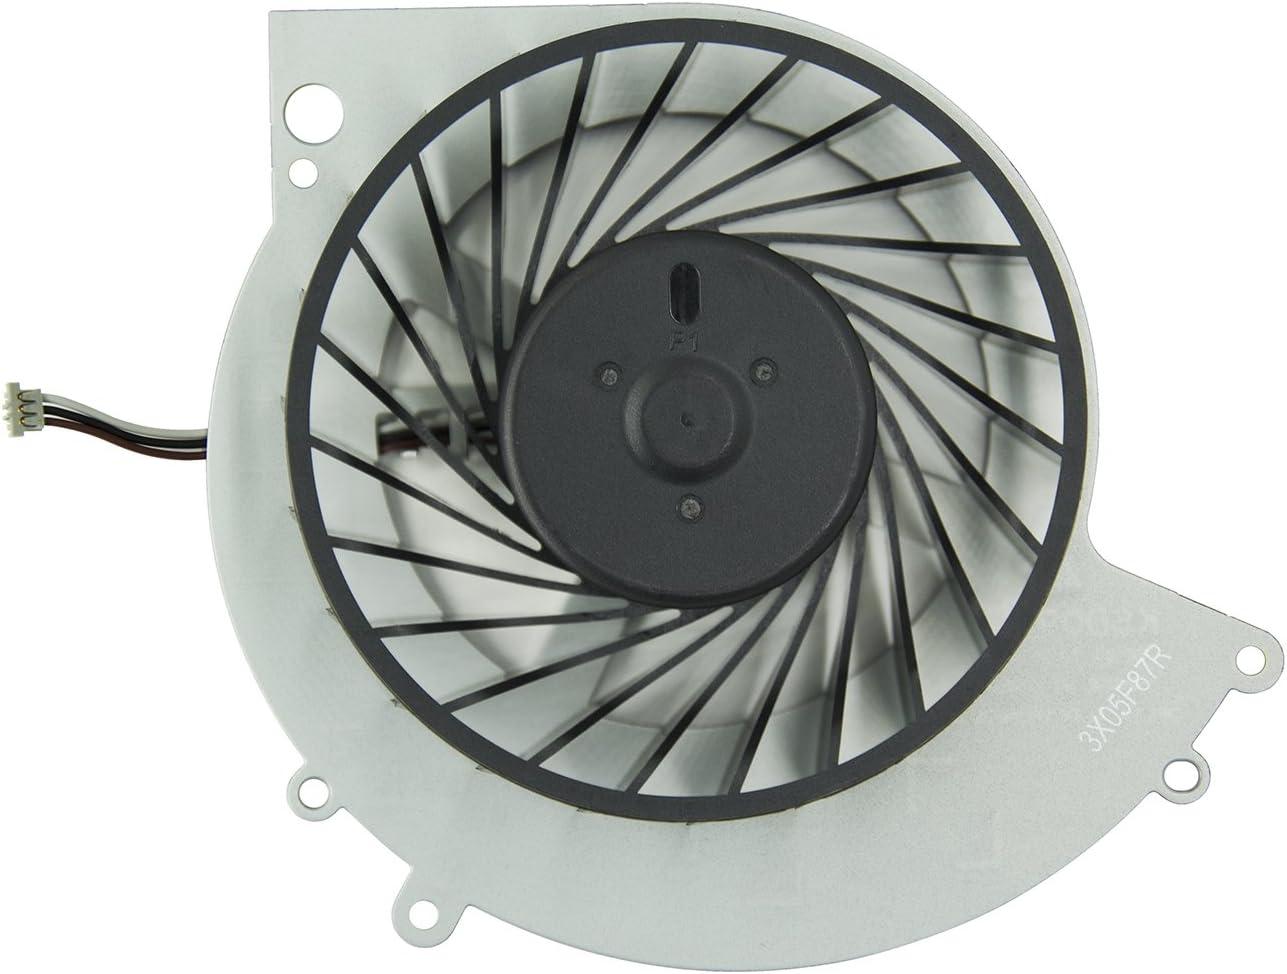 Replacement Internal Cooling Fan KSB0912HE for PS4 CUH-10XXA 500GB ...